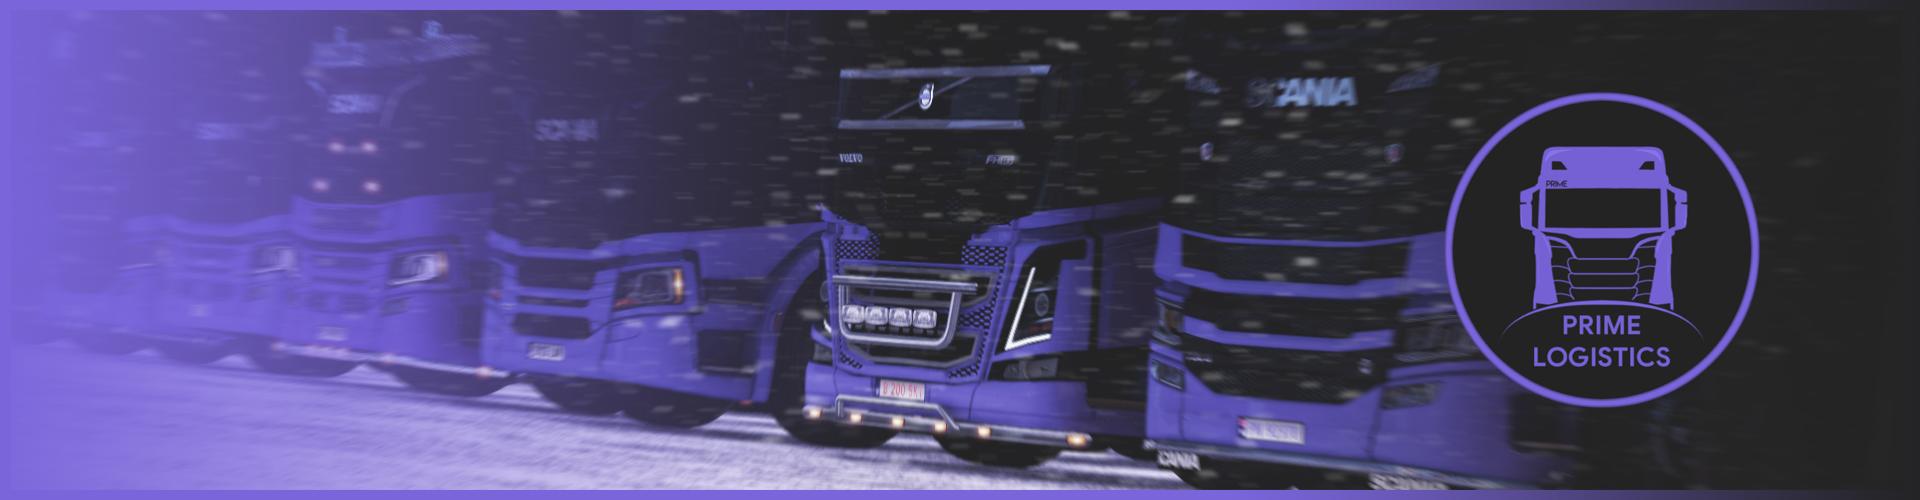 🟣 Prime Logistics Convoy #89